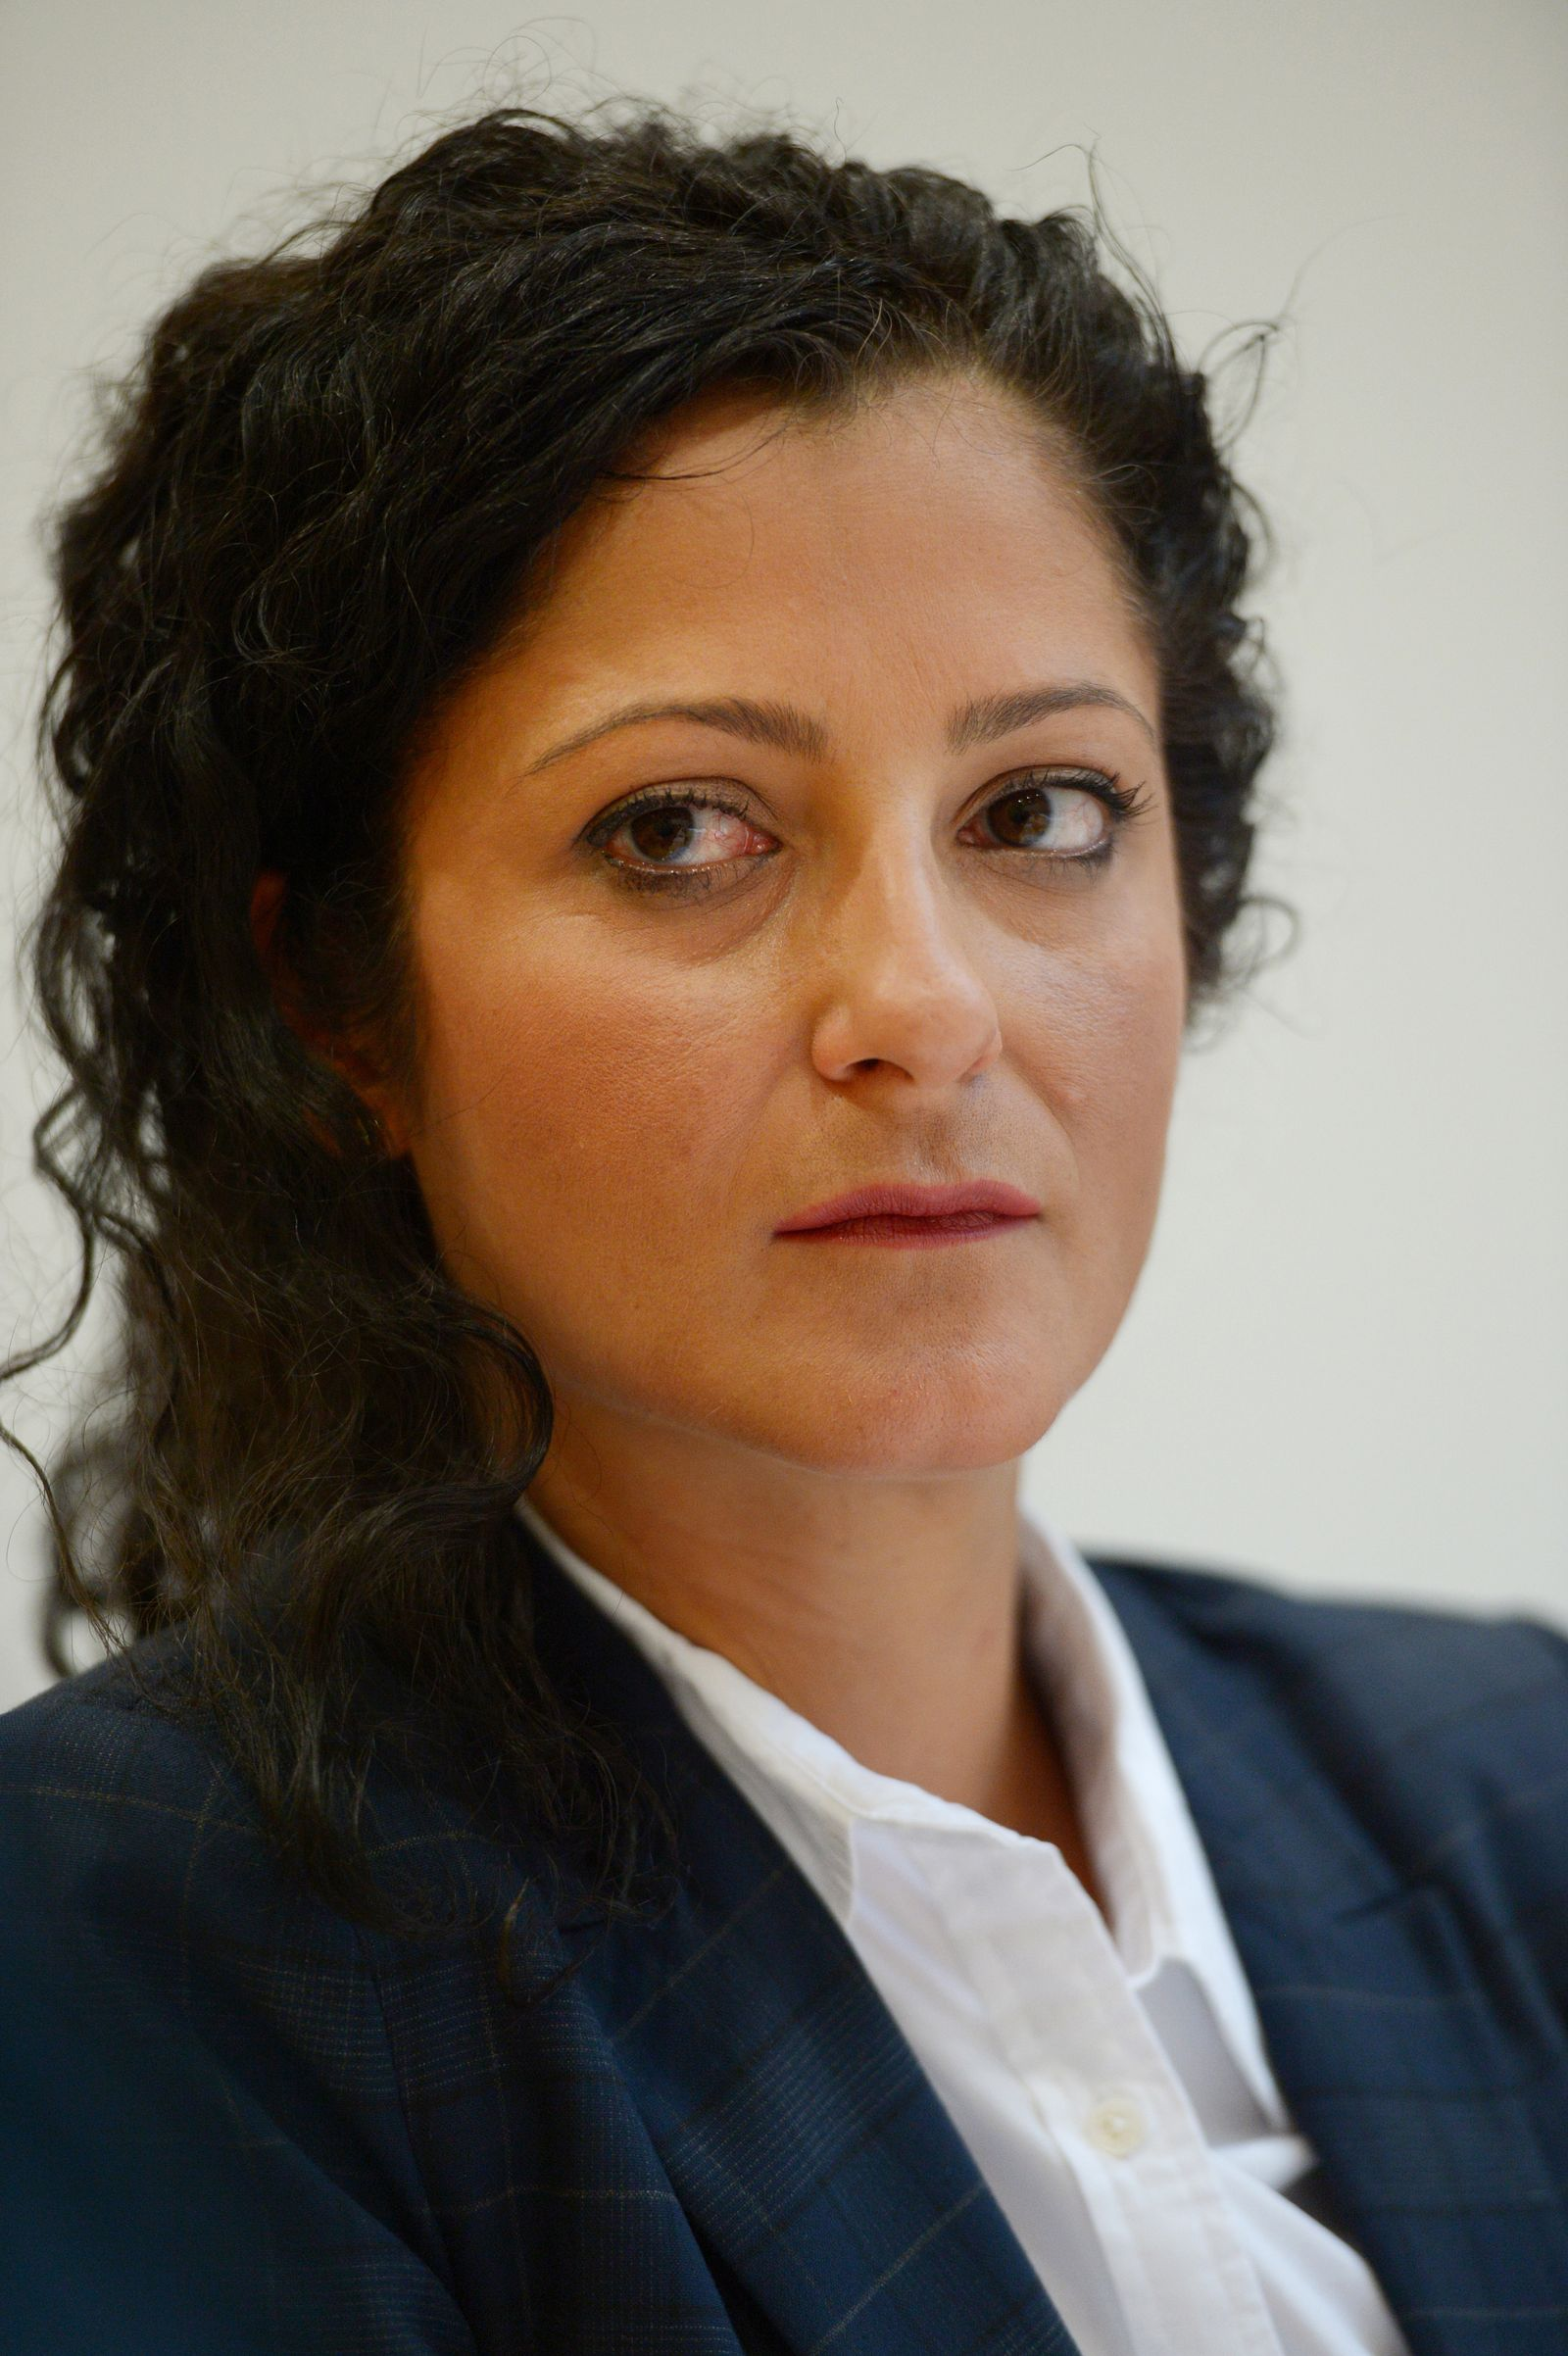 Bundestagsabgeordnete Cansel Kiziltepe